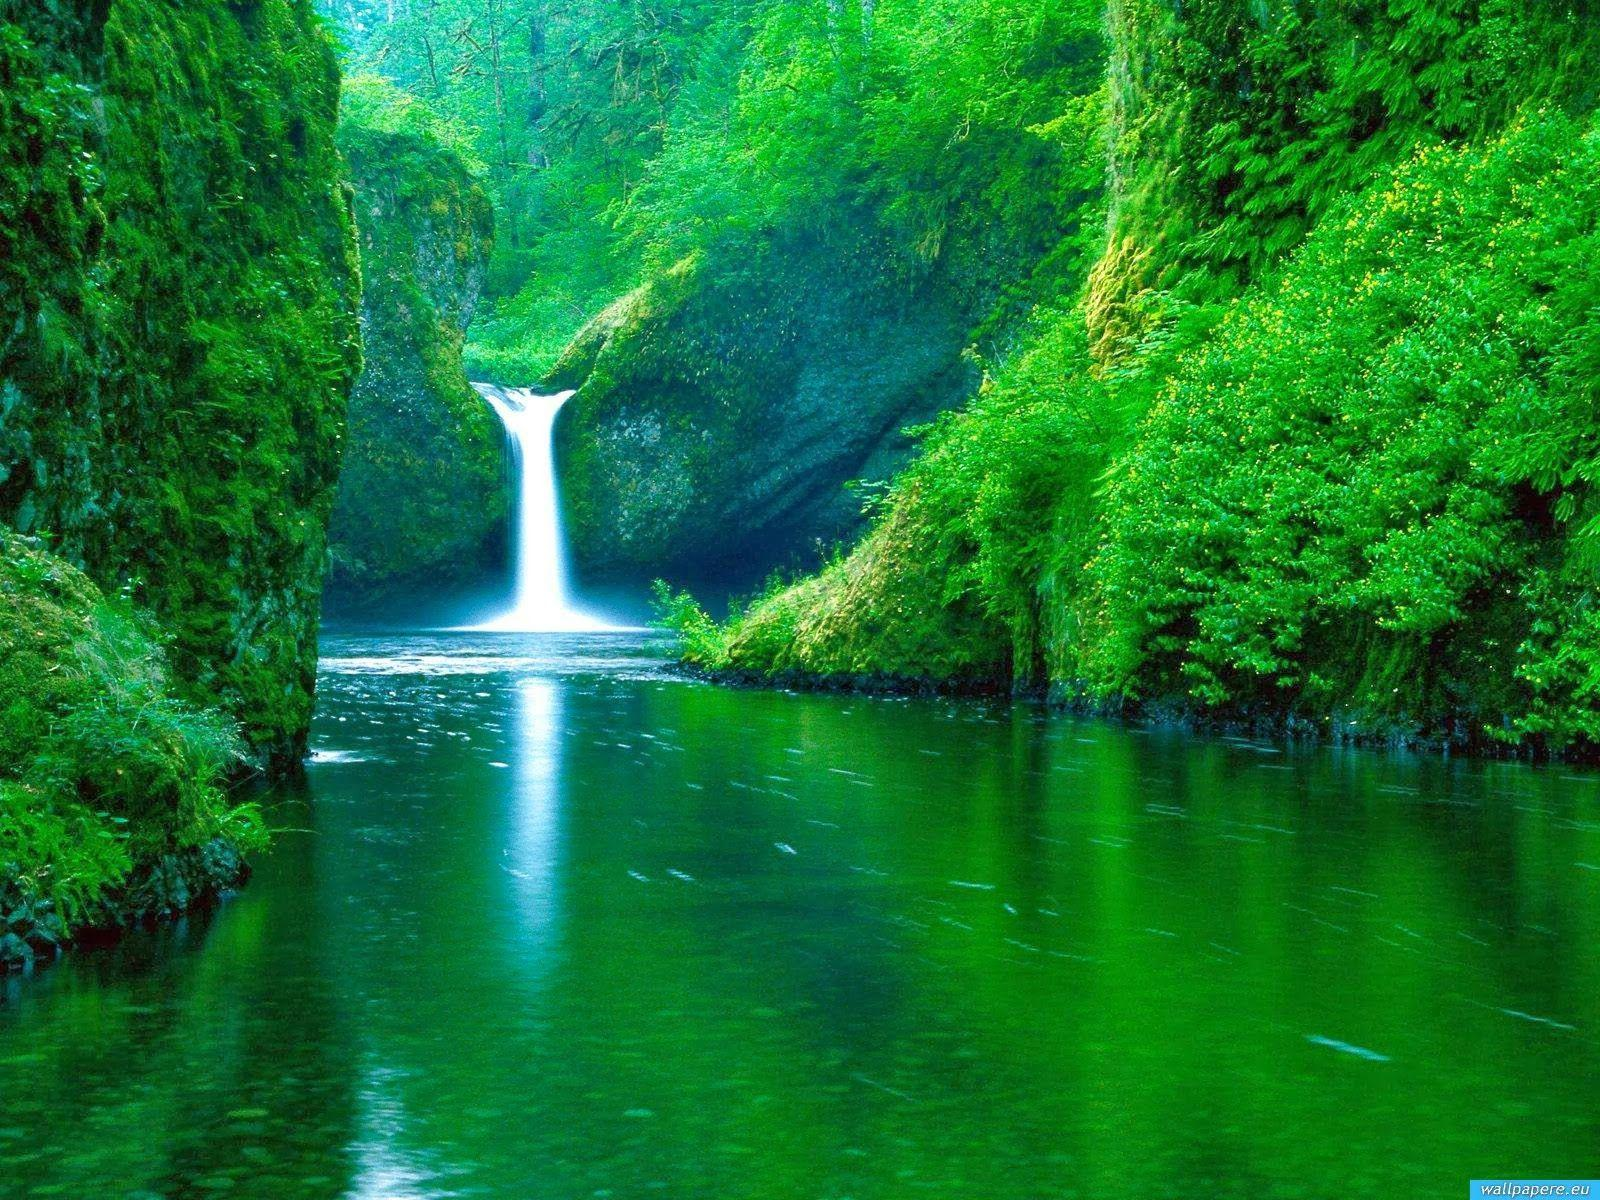 Nature Wallpapers Free Download - BDFjade